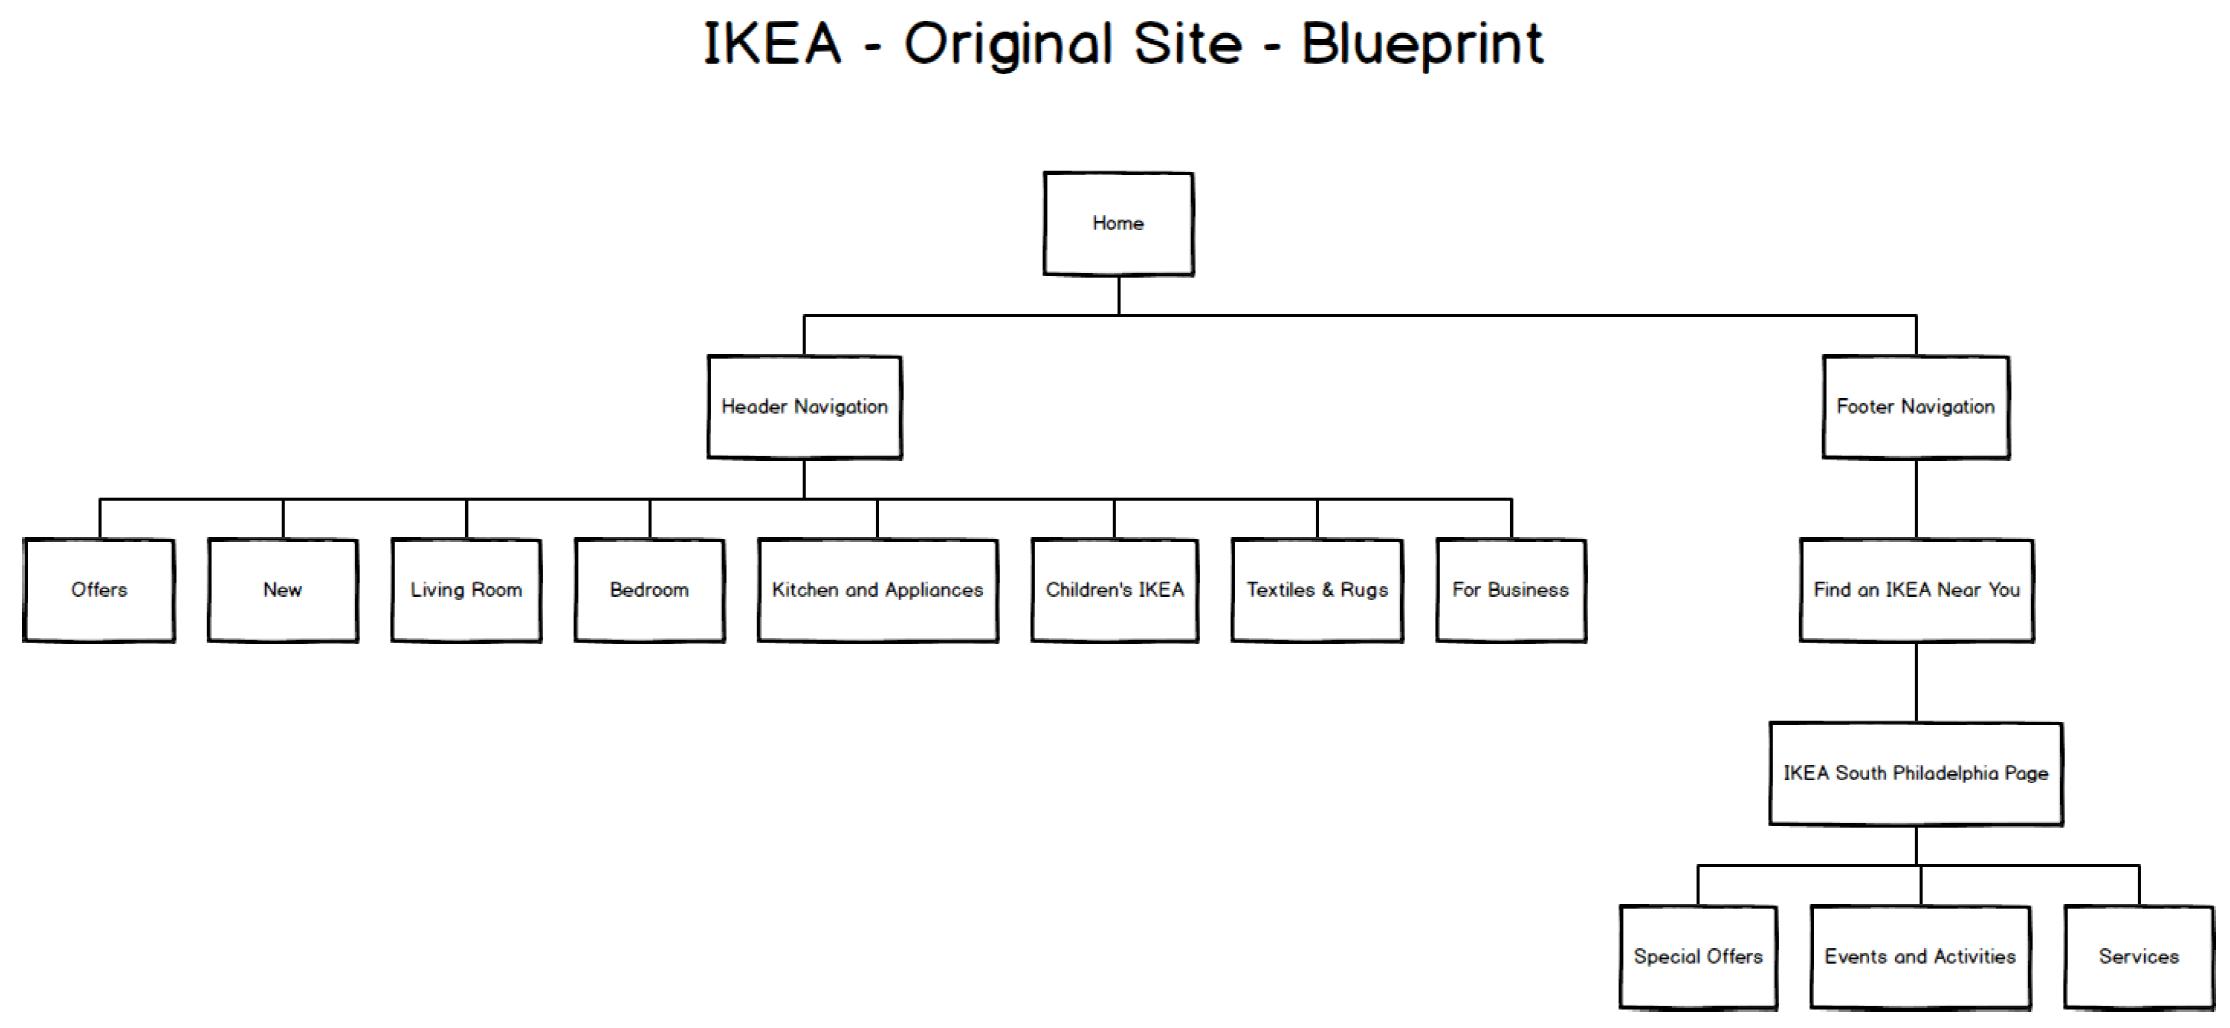 Ikea user experience analysis web user experience designer ikea original blueprint malvernweather Gallery